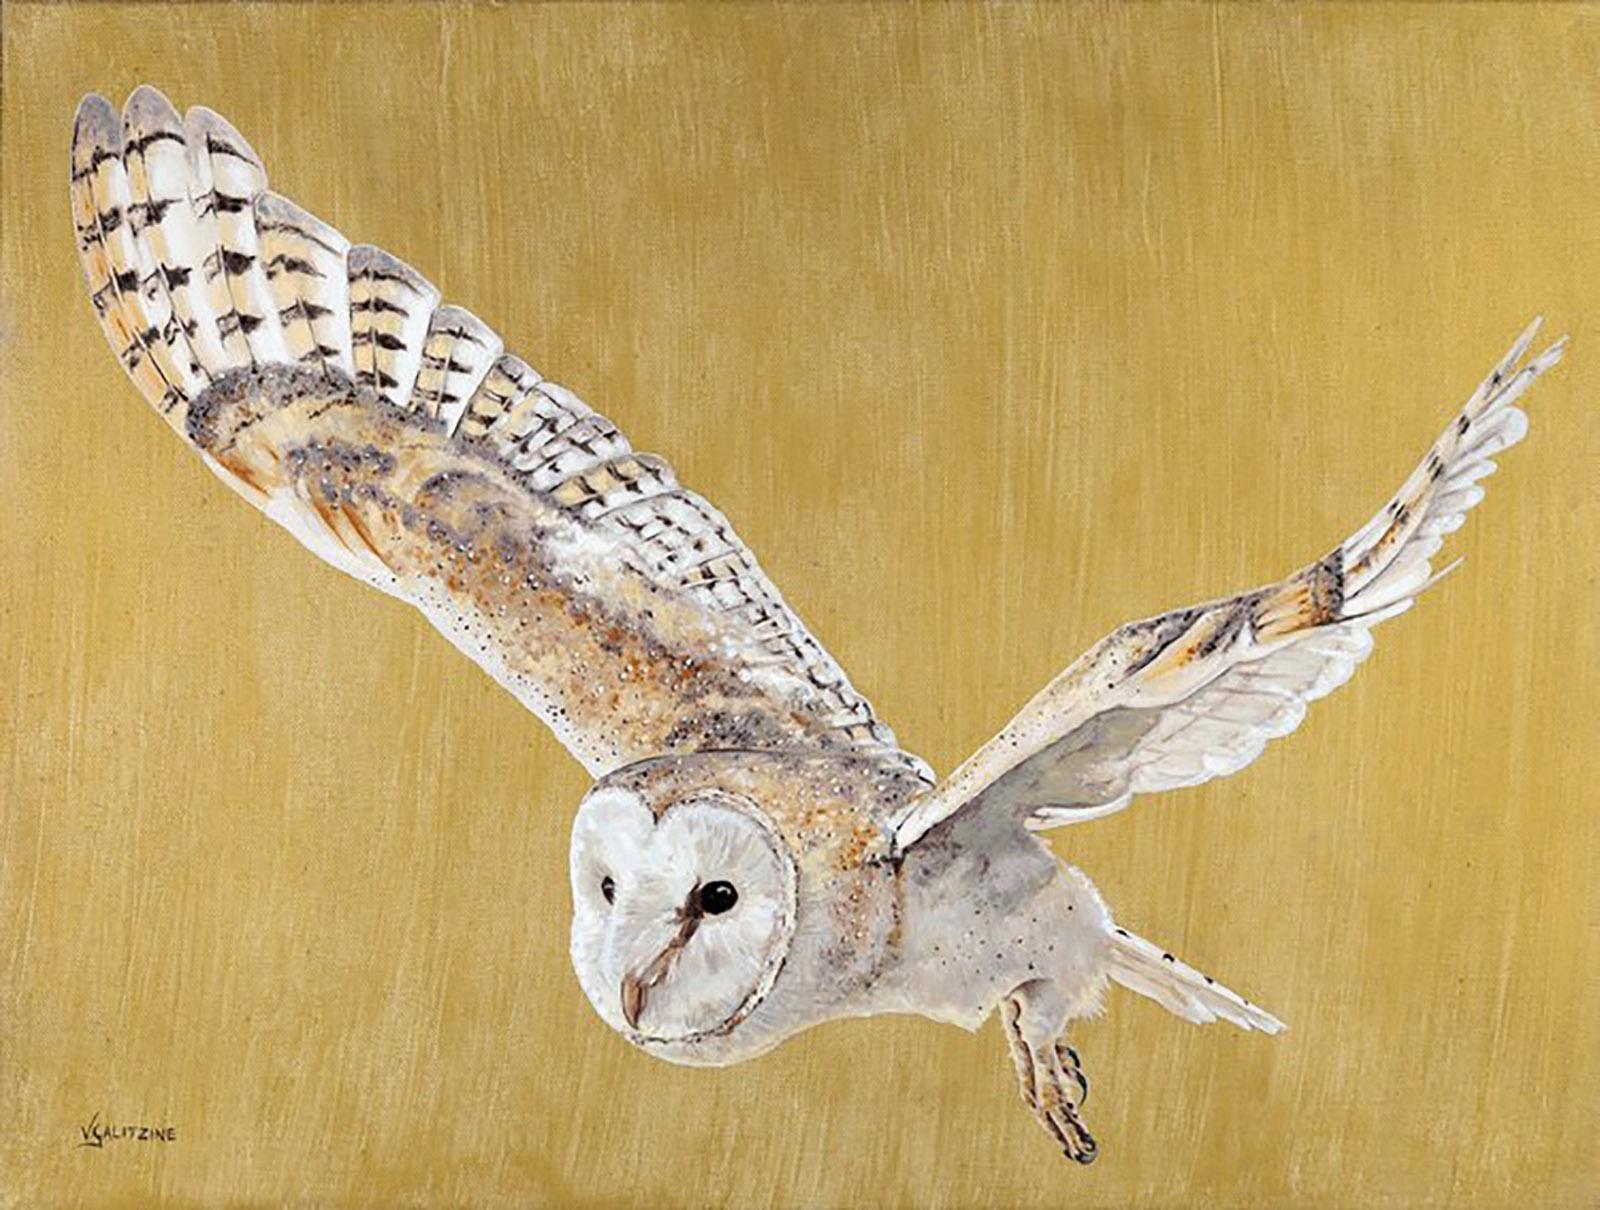 23.Owl+in+flight+Tori